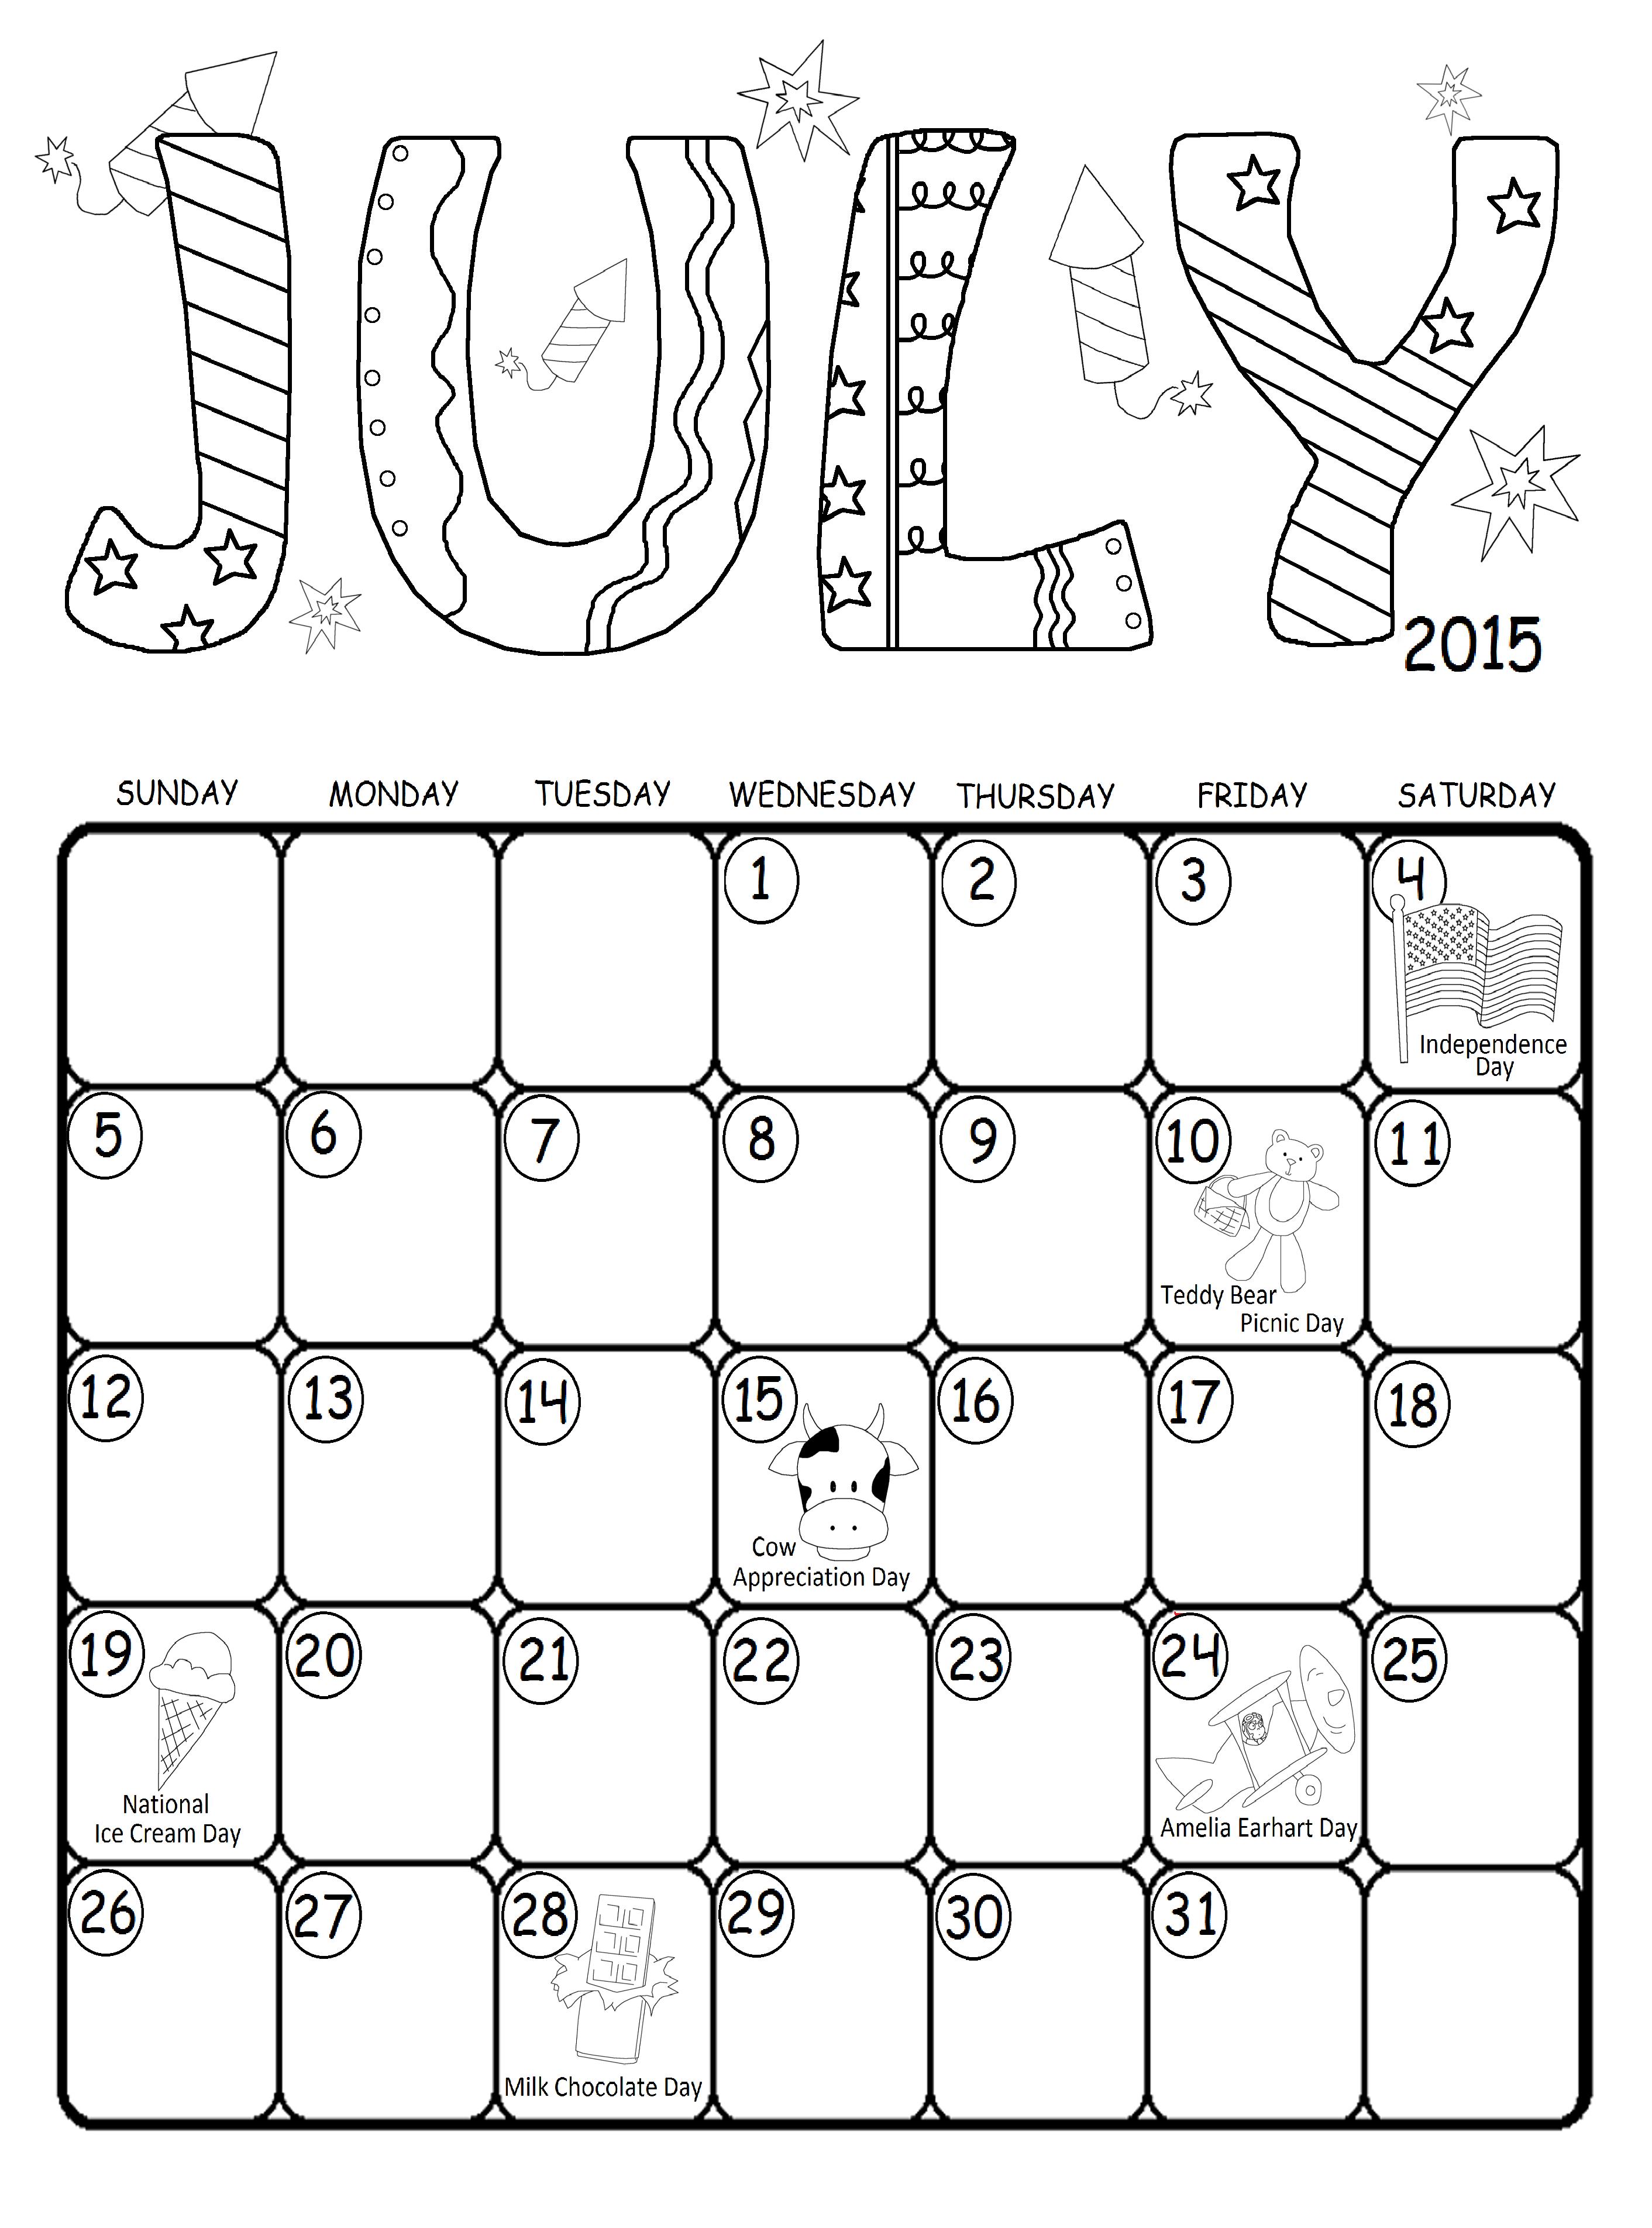 July 2015 Calendar For Kids With Fun Holidays Free Printable Kids Calendar Toddler School Holiday Fun